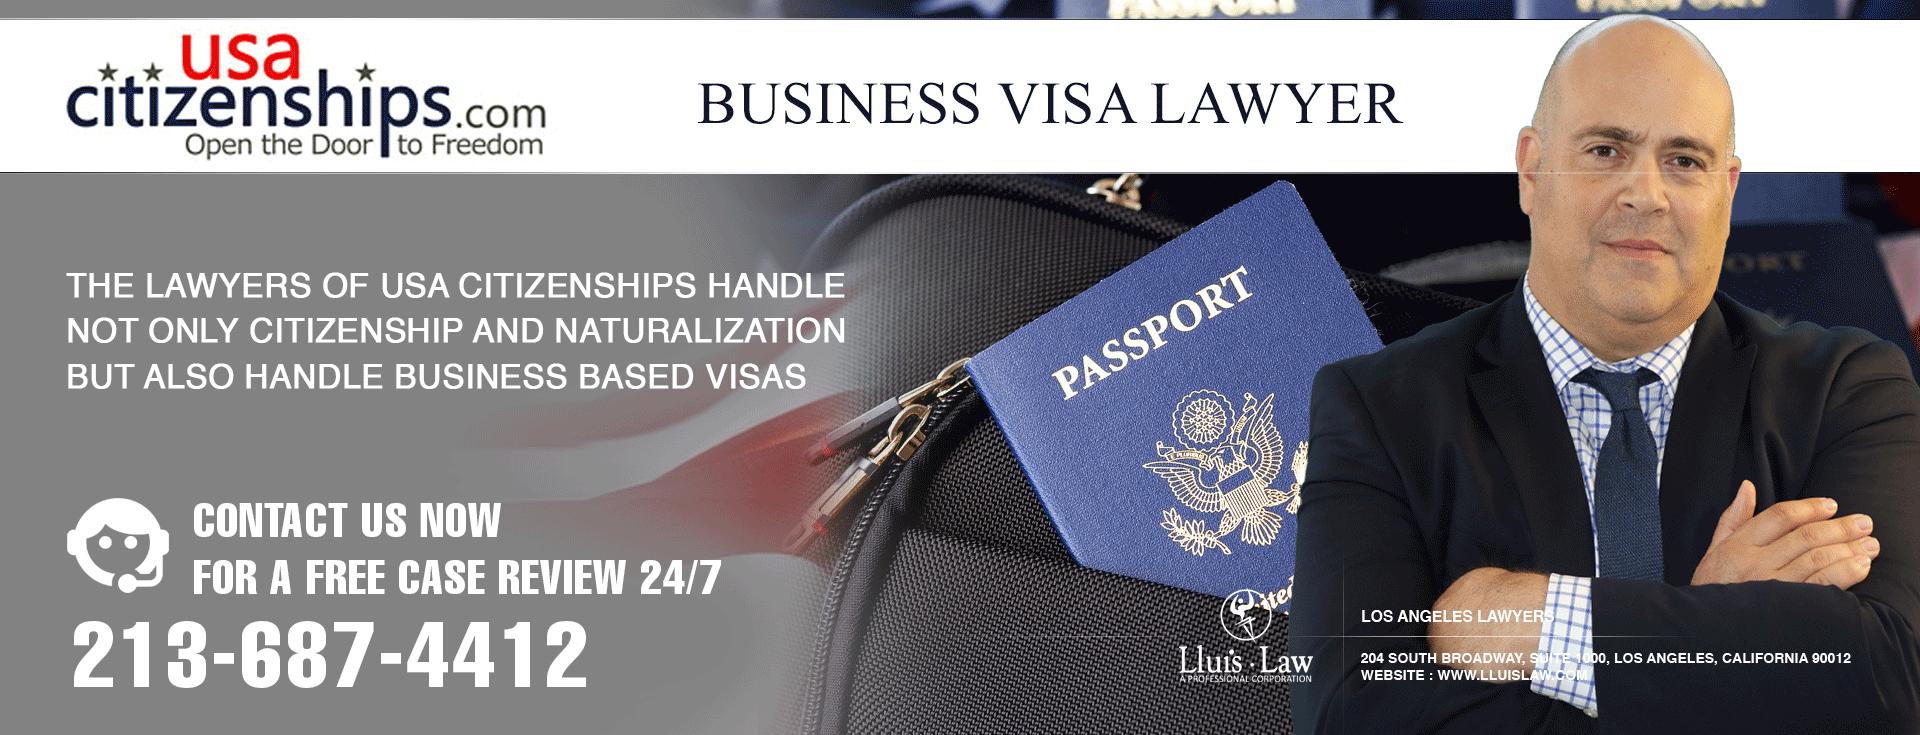 los angeles business visa lawyer